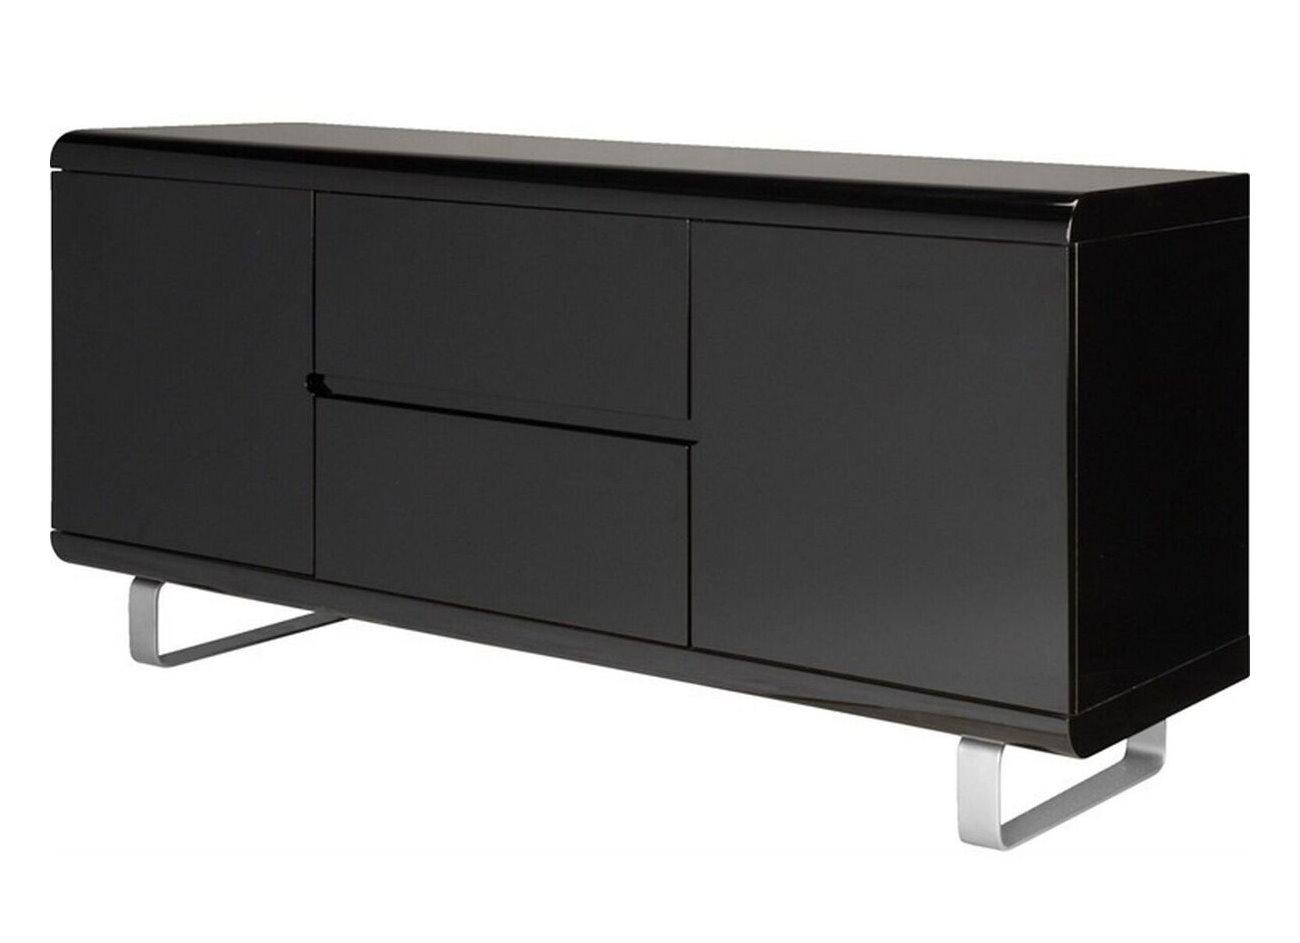 sideboard spacy hochglanz schwarz kommode schubladen. Black Bedroom Furniture Sets. Home Design Ideas